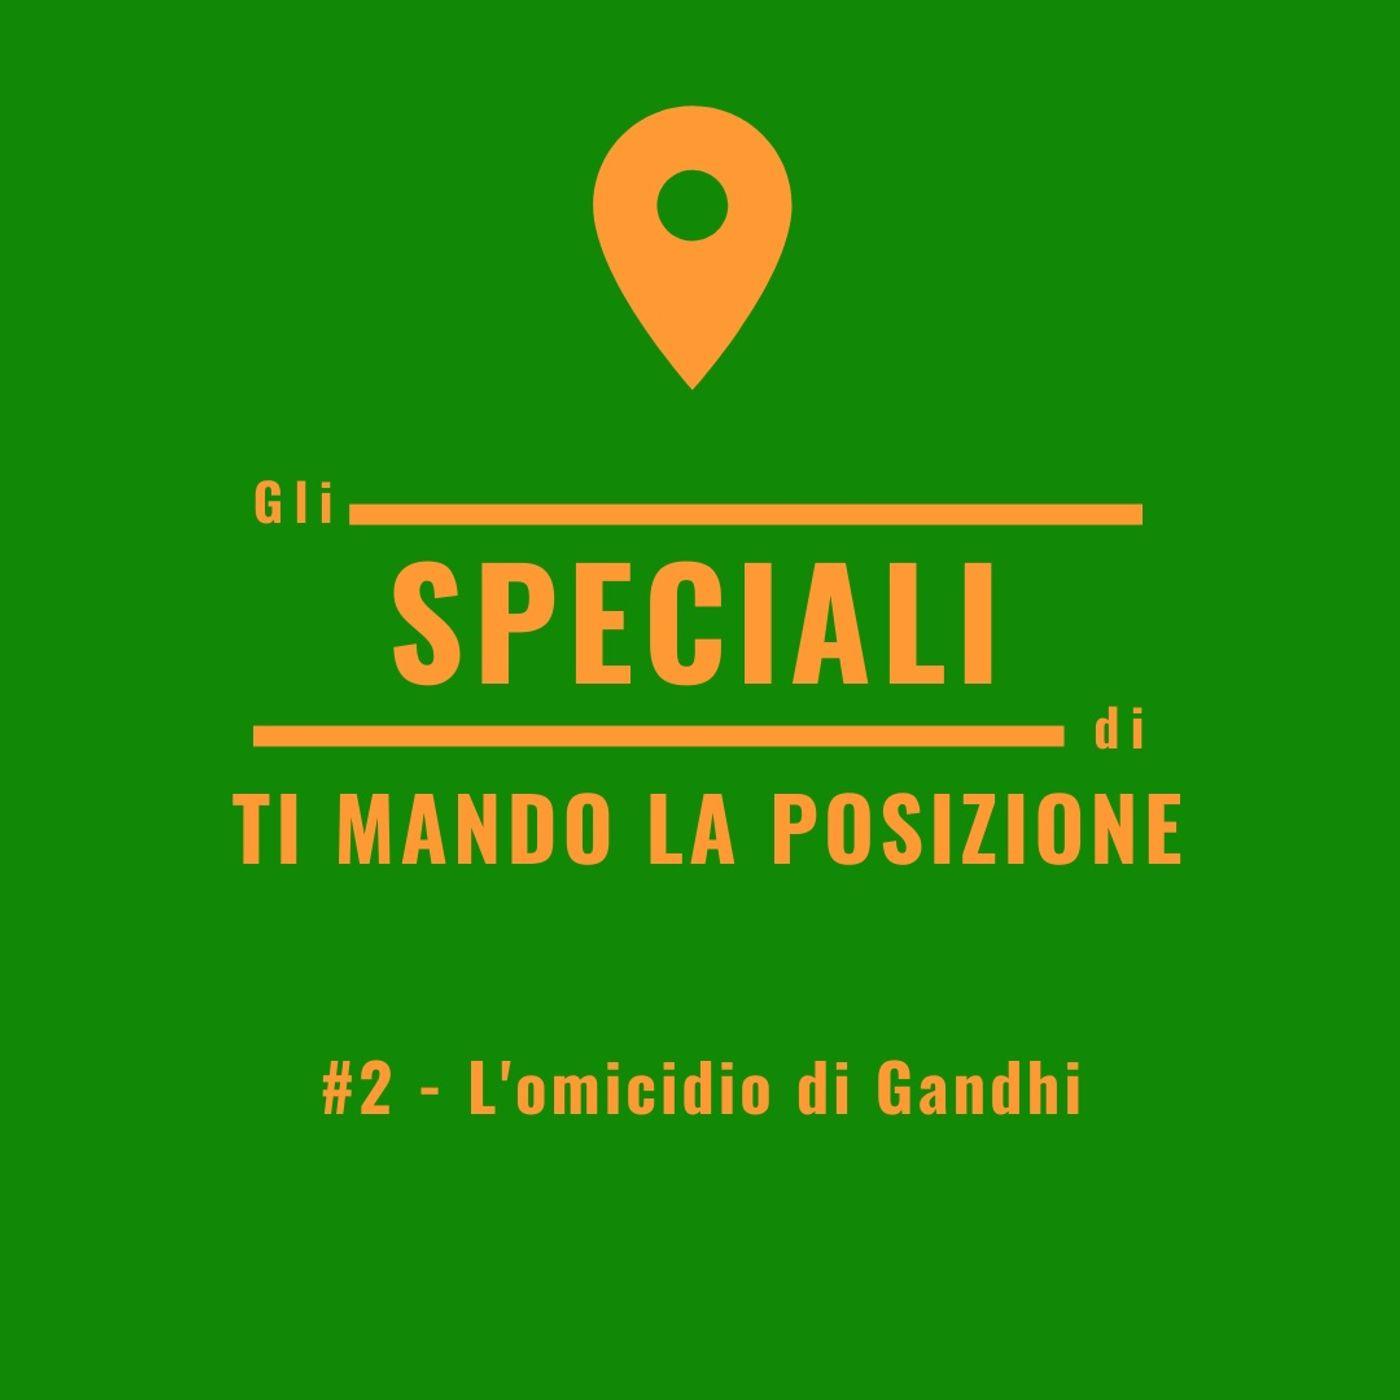 Speciale #2 - L'omicidio di Gandhi